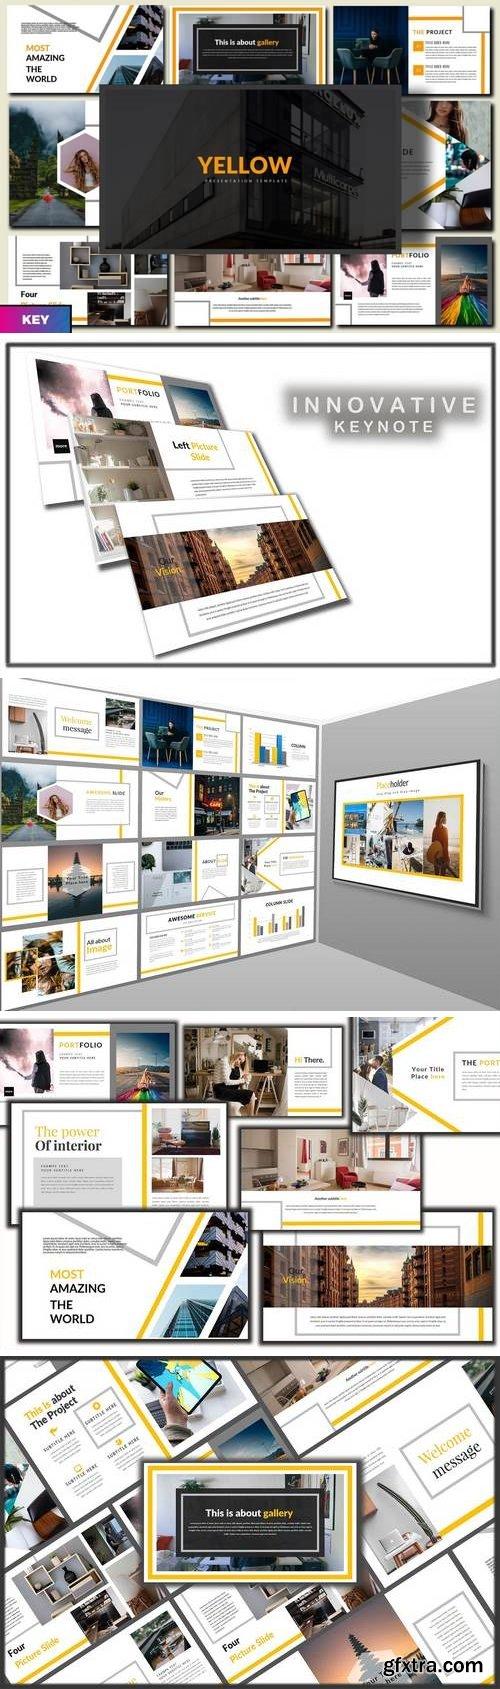 Yellow - Innovative Keynote Template